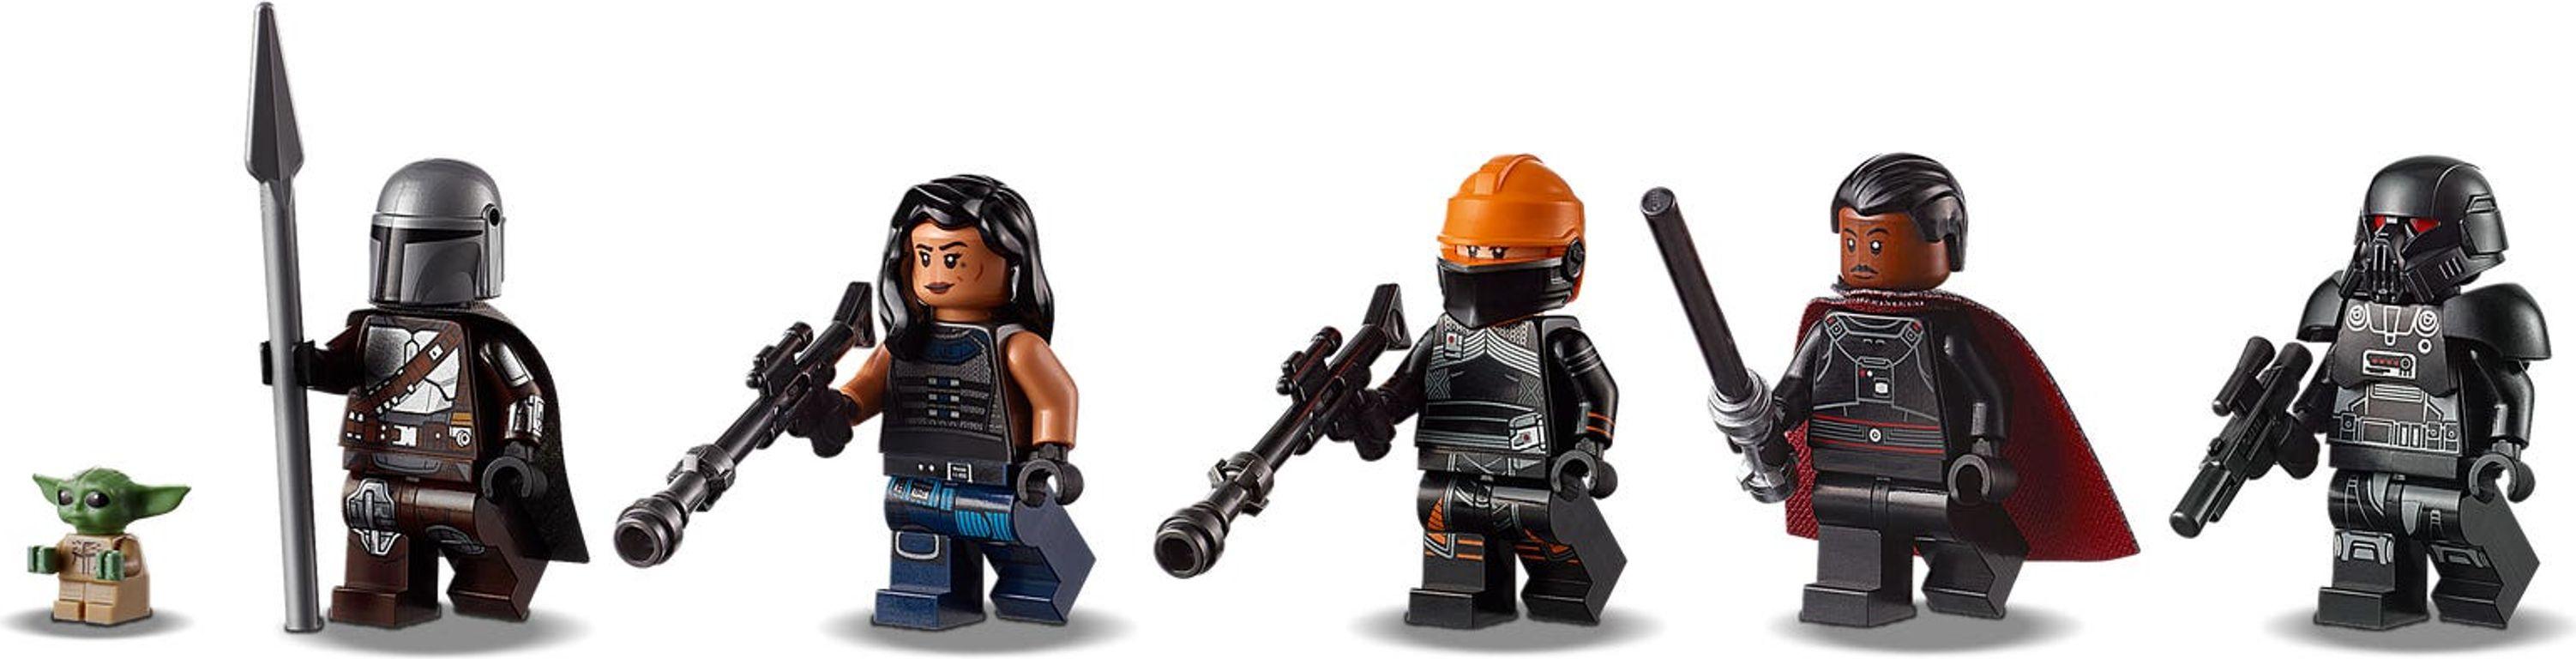 LEGO® Star Wars Imperial Light Cruiser™ minifigures